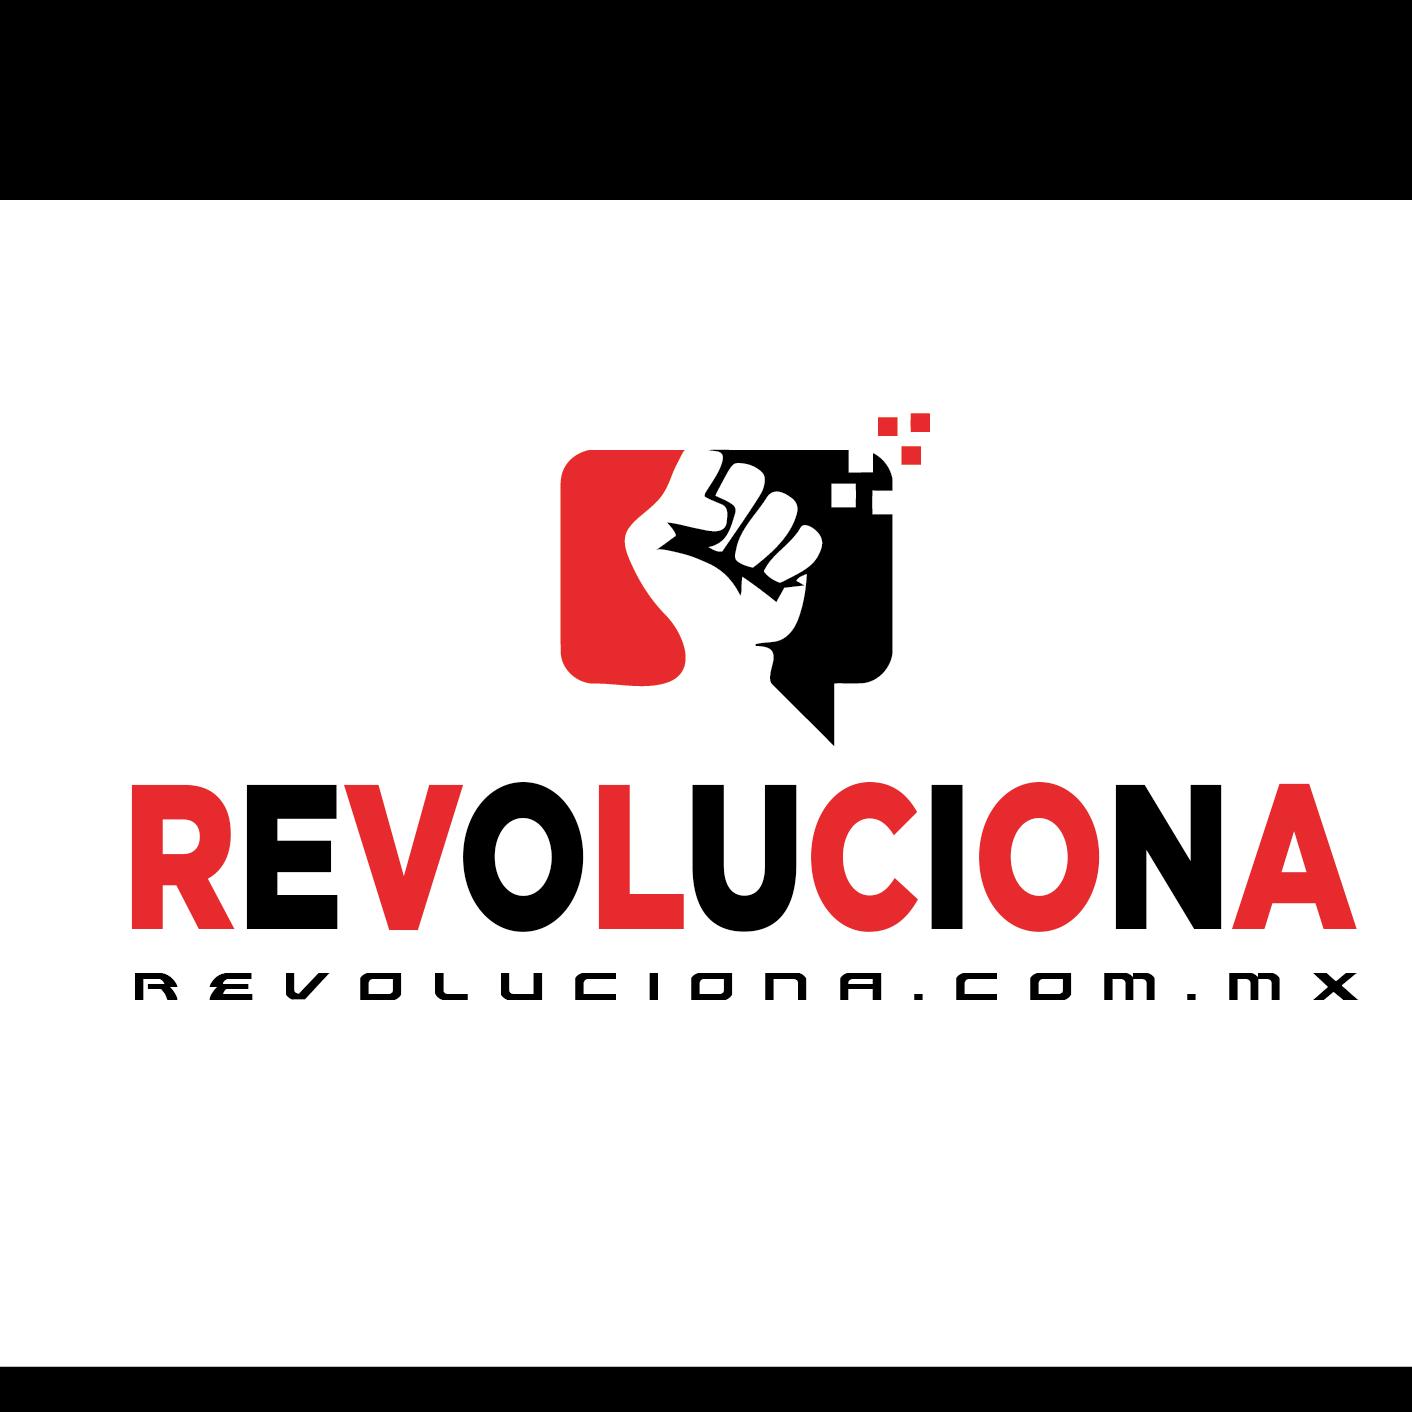 Revoluciona.com.mx